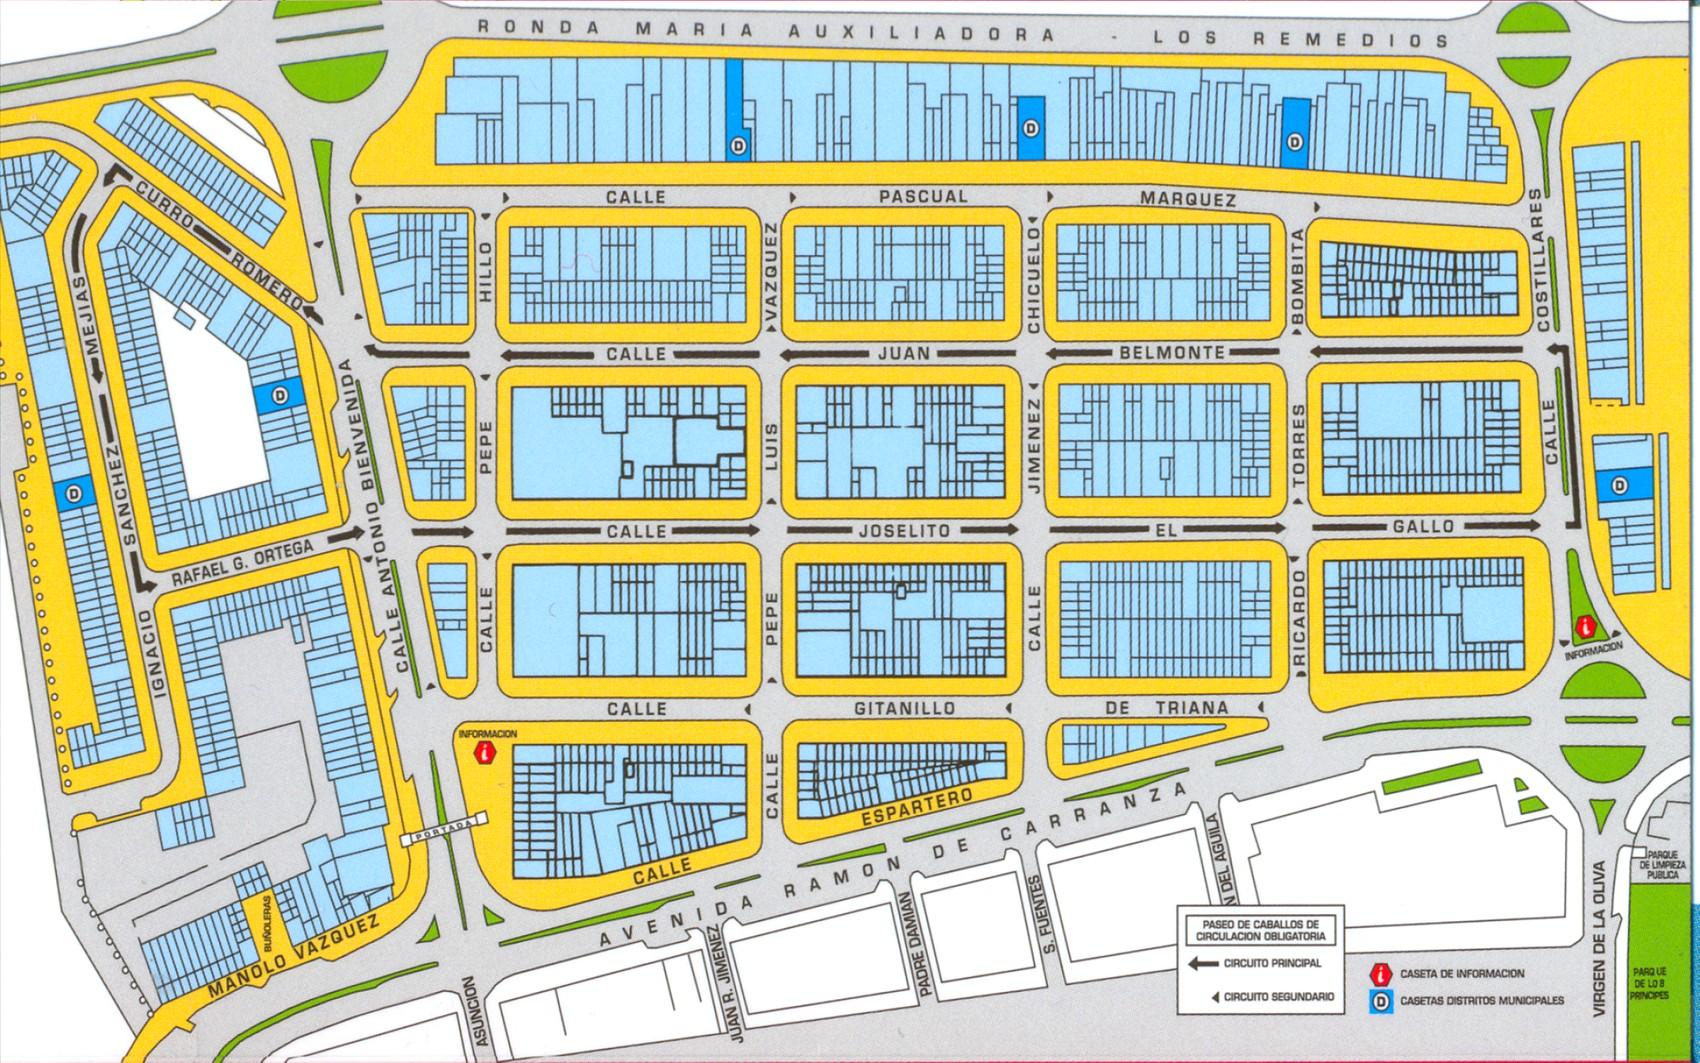 Mapa Feria Sevilla 2019.Plano Feria Big Feria De Abril De Sevilla 2020 Feria De